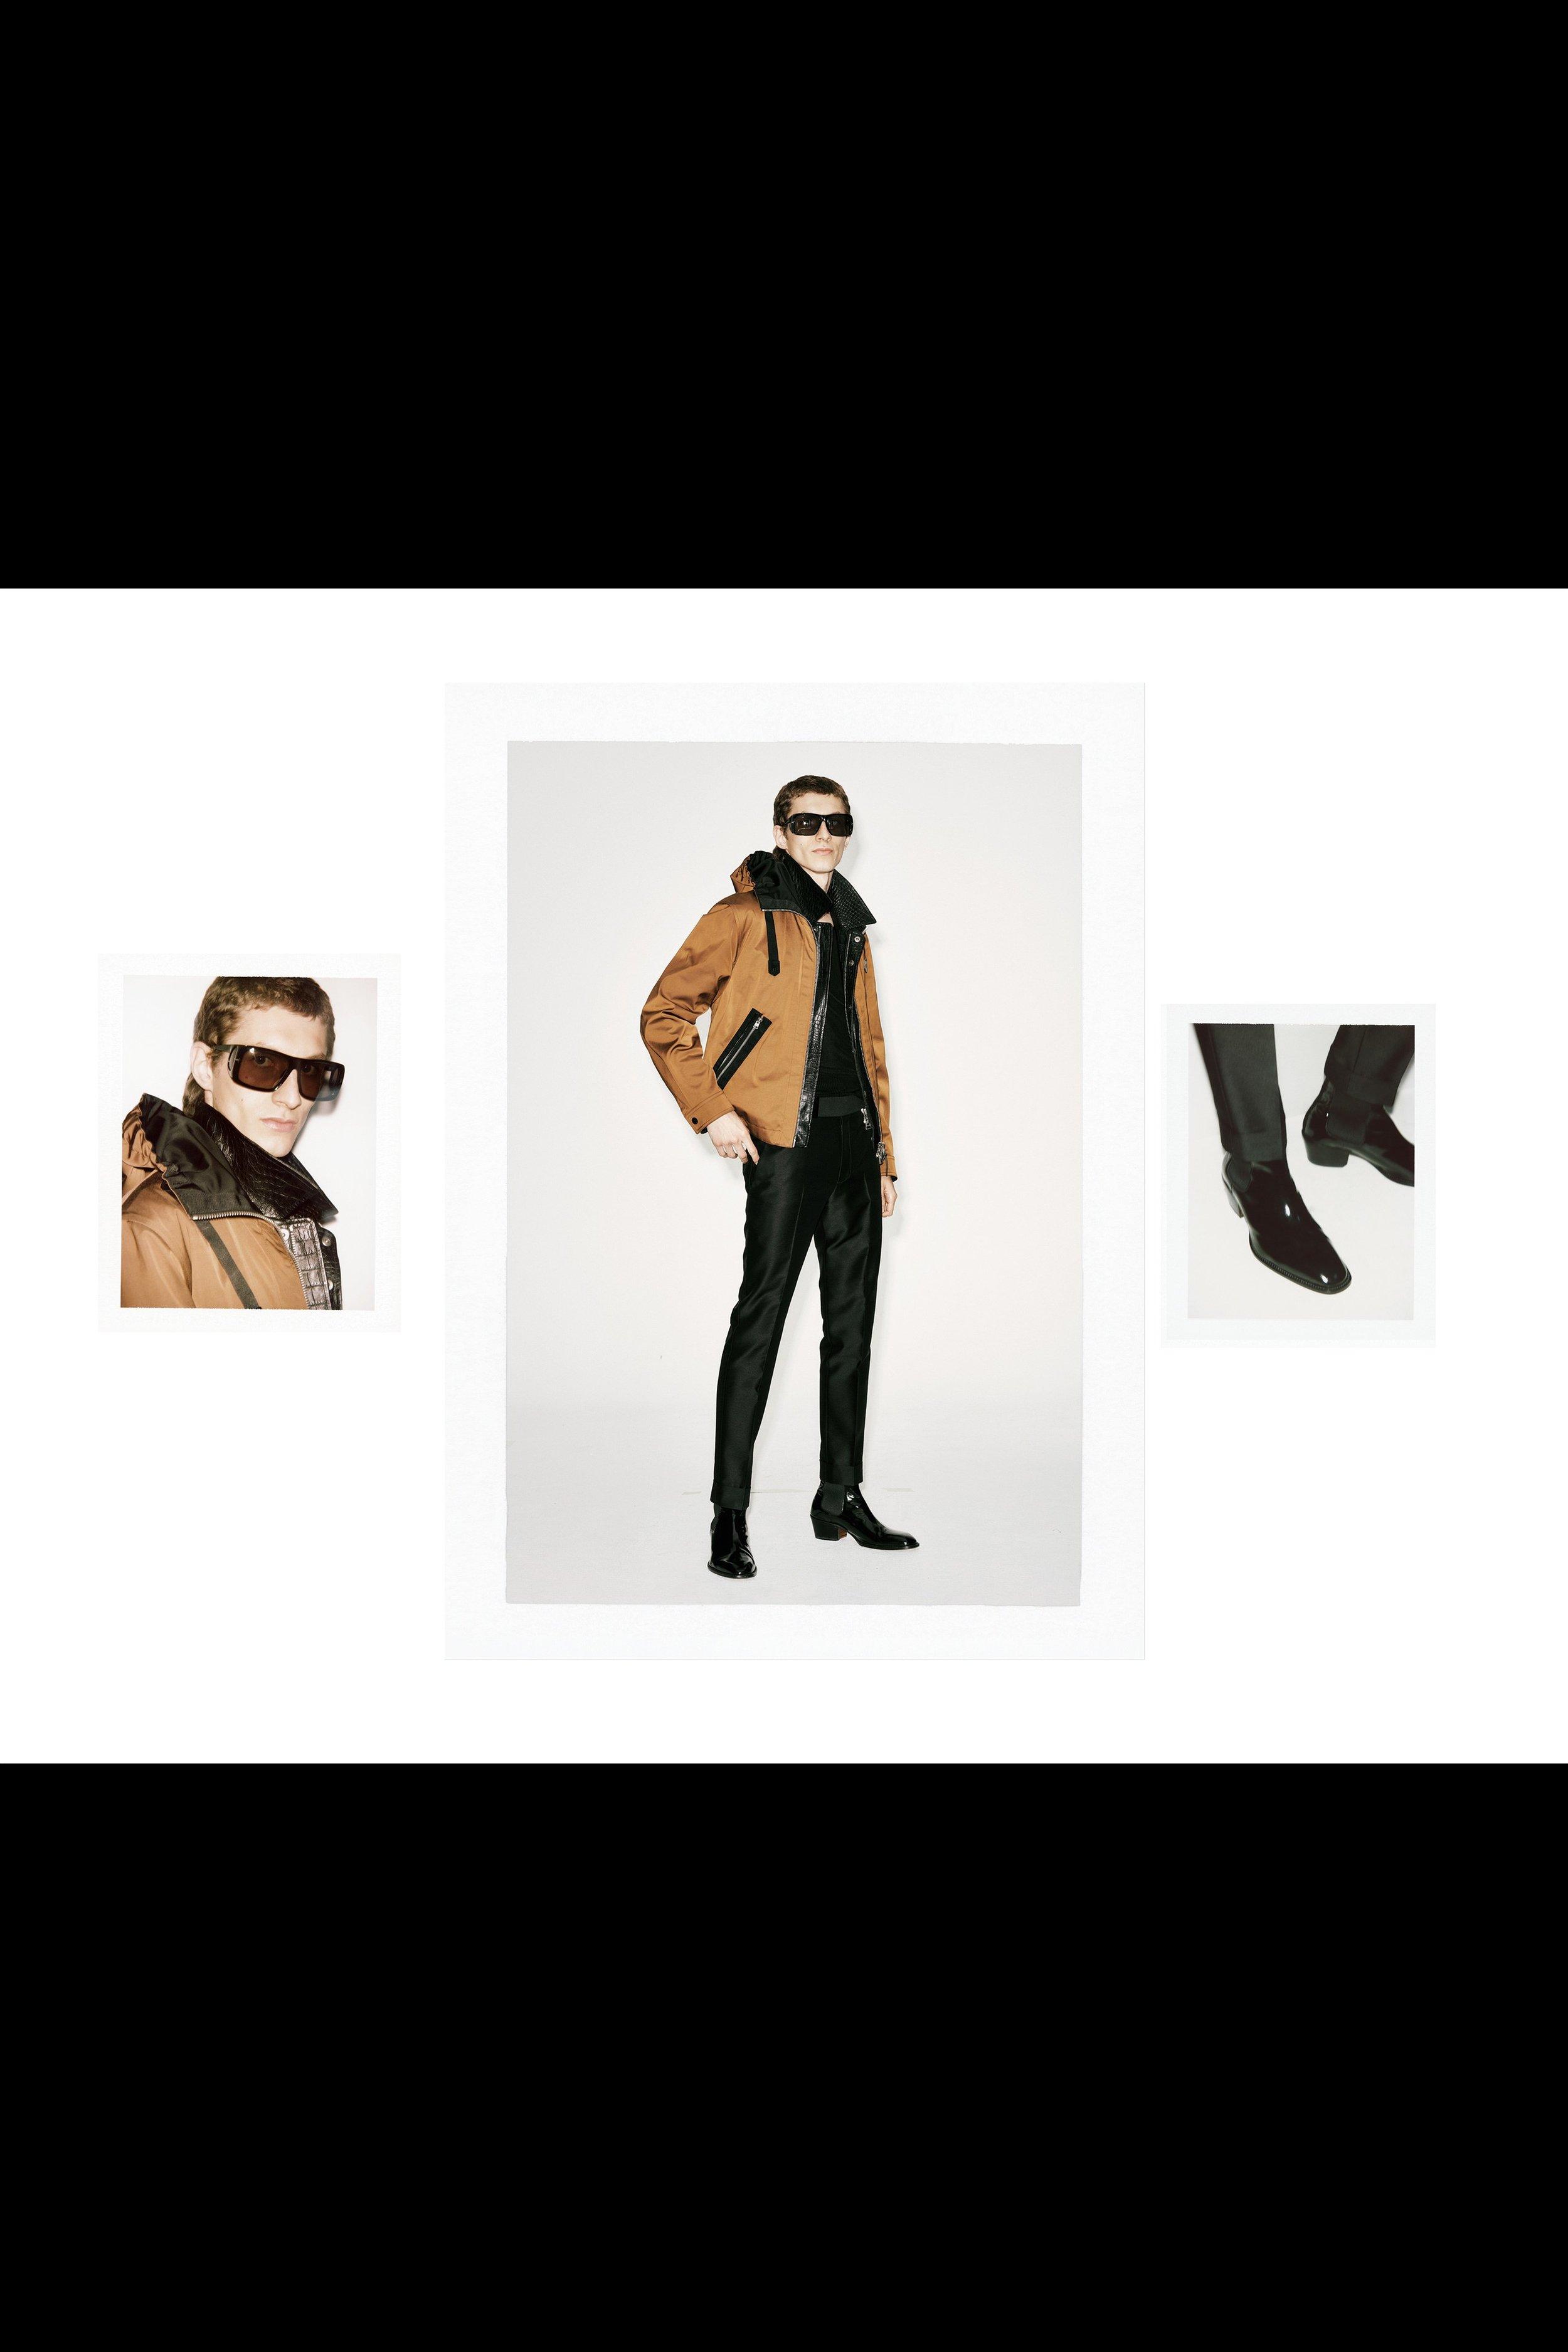 00024-Tom-Ford-vogue-menswear-spring-2019-pr.jpg